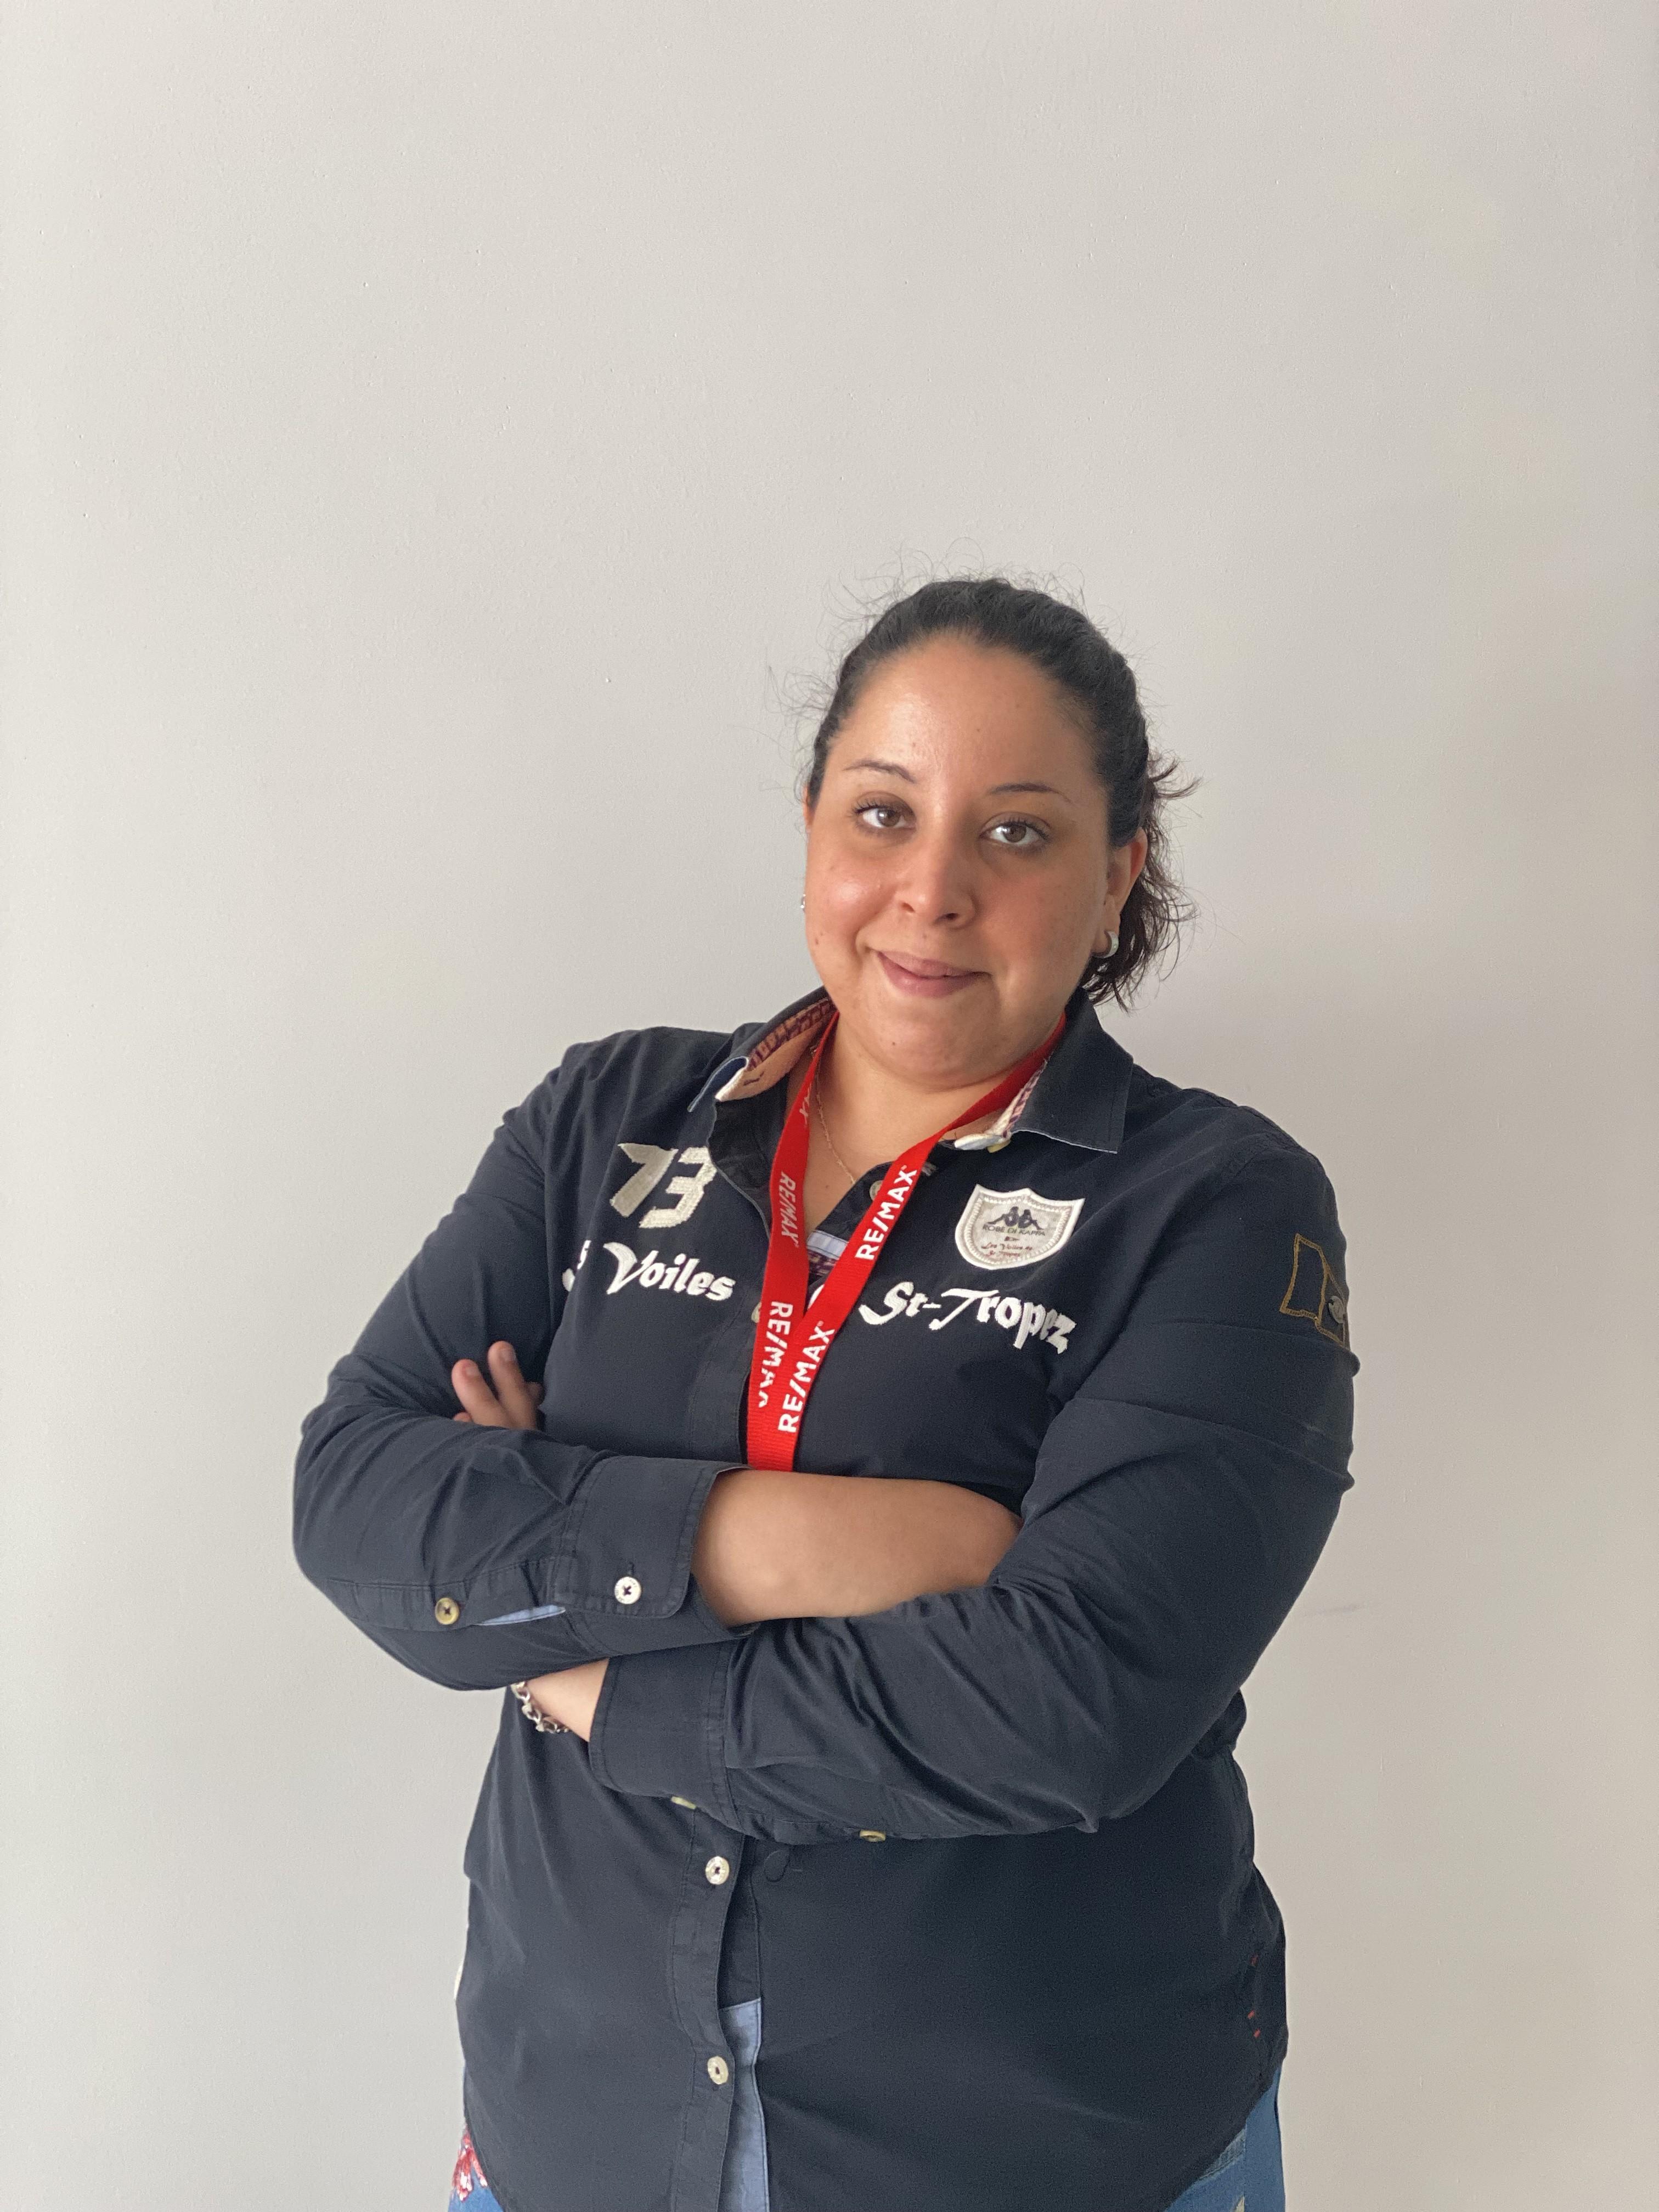 Paula Rubio Díaz-Mínguez